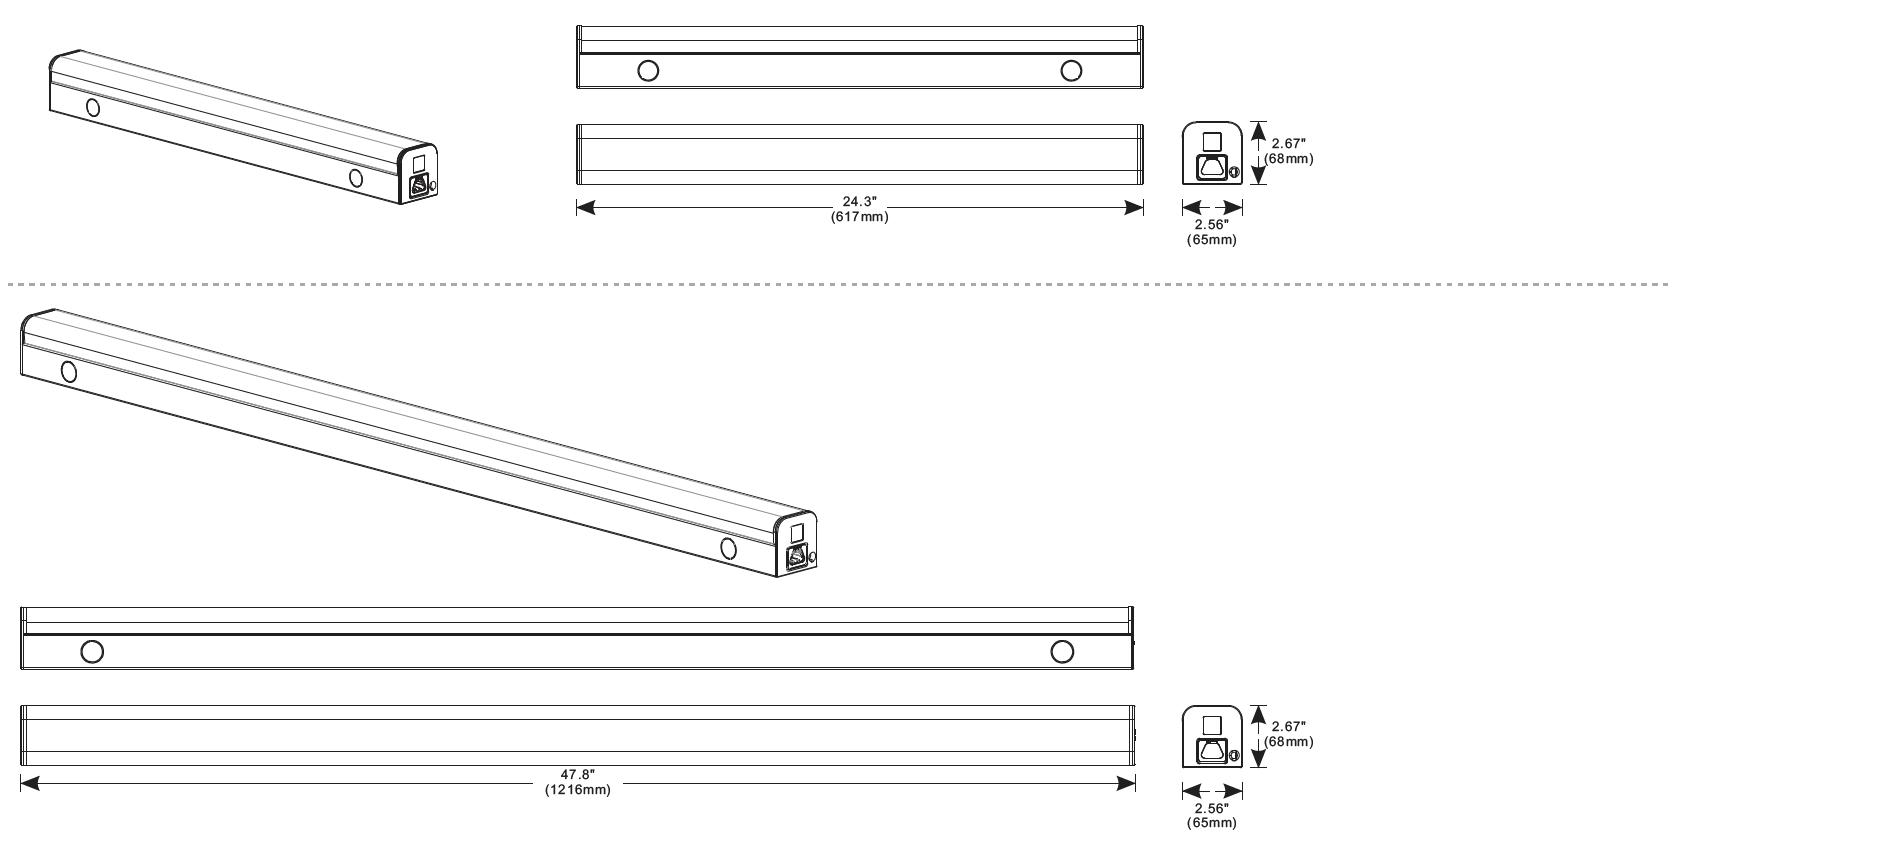 GSR LED Drawing